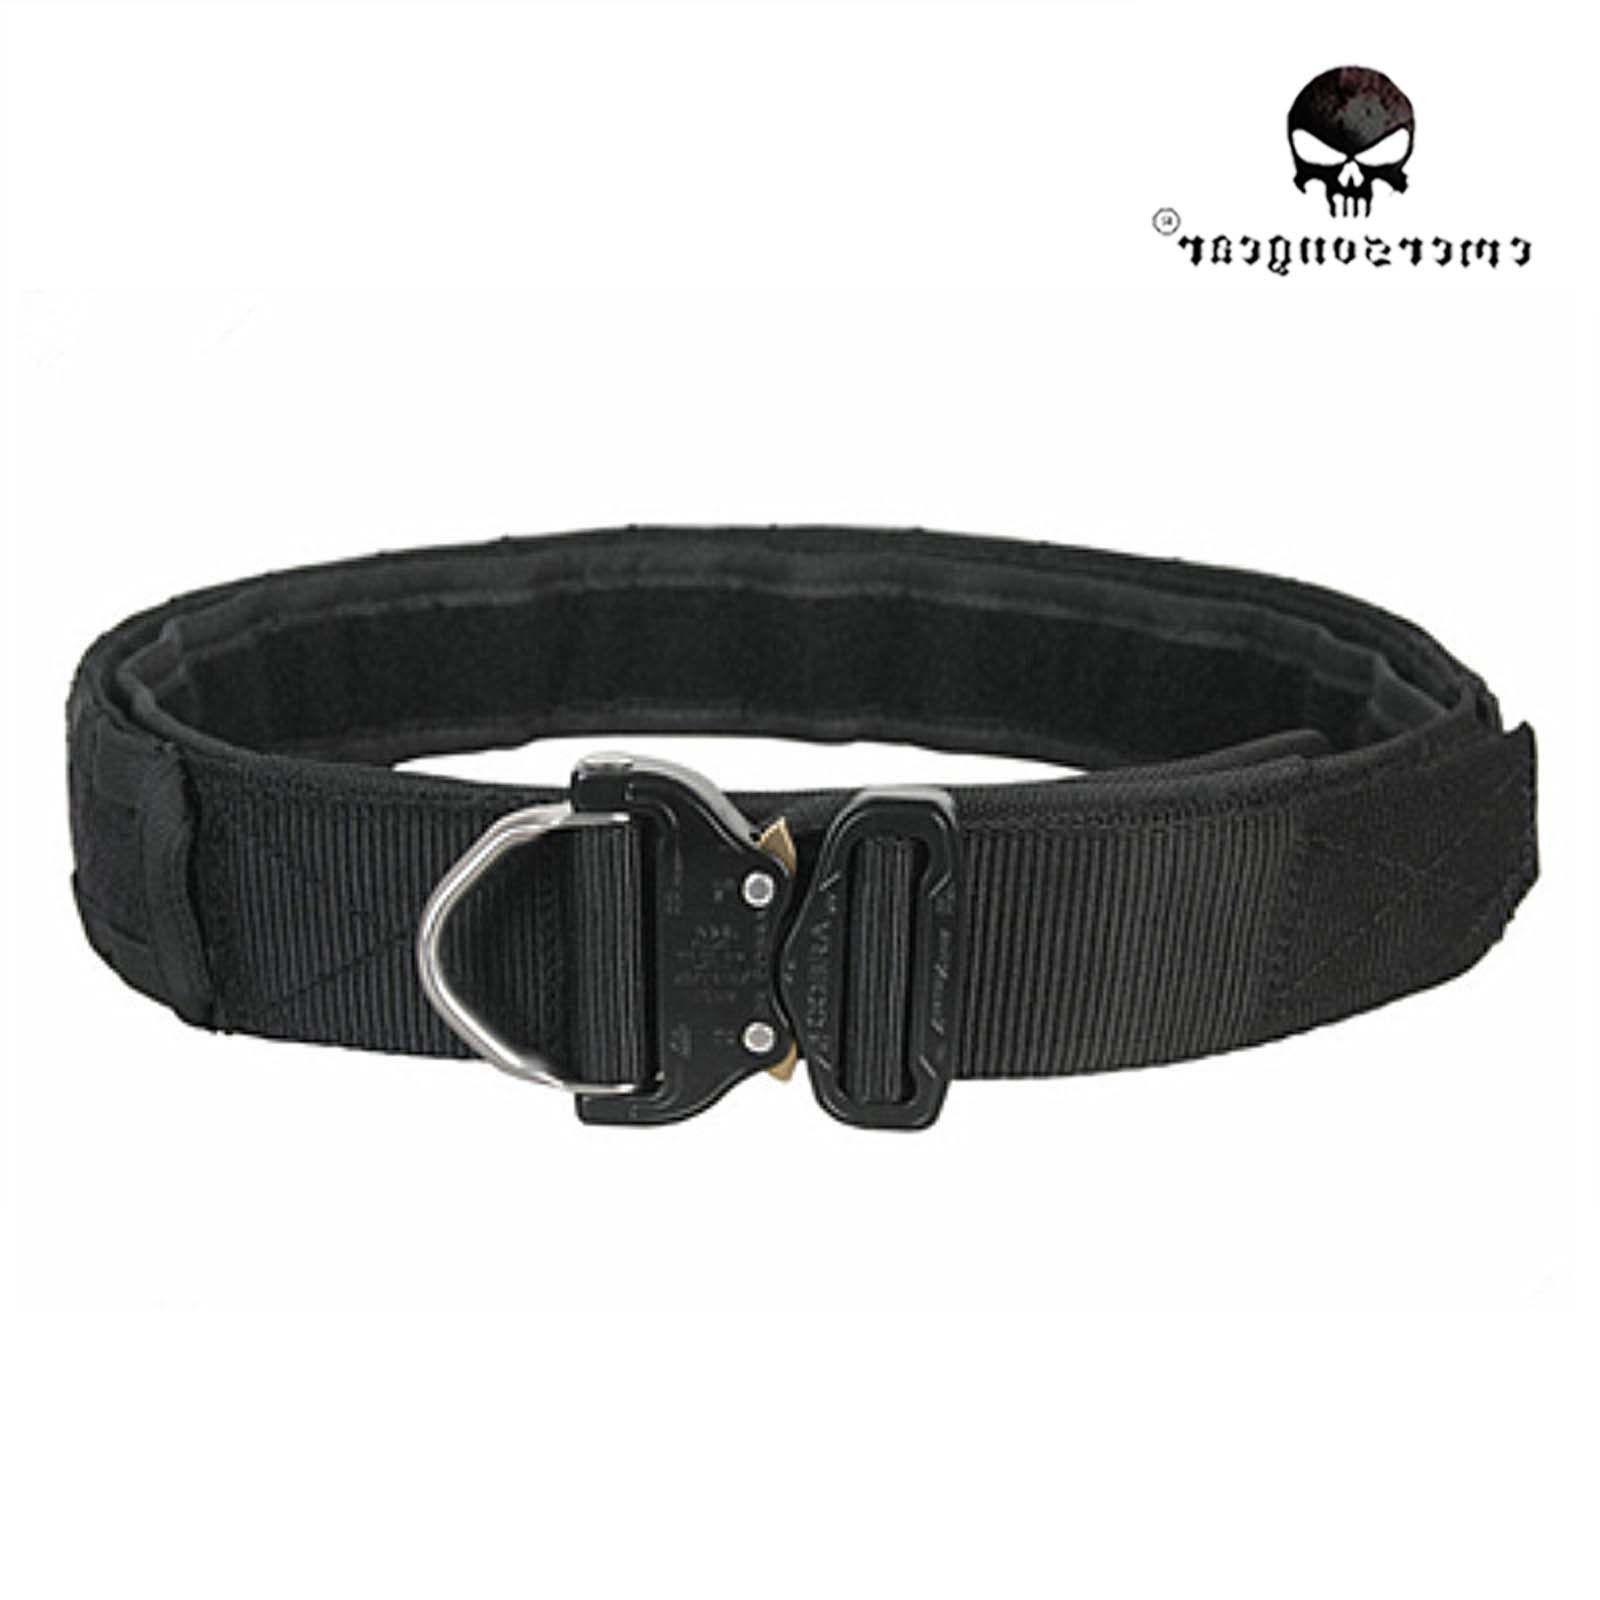 Emerson Cobra D-Ring 1.75-2inch Amy Gear